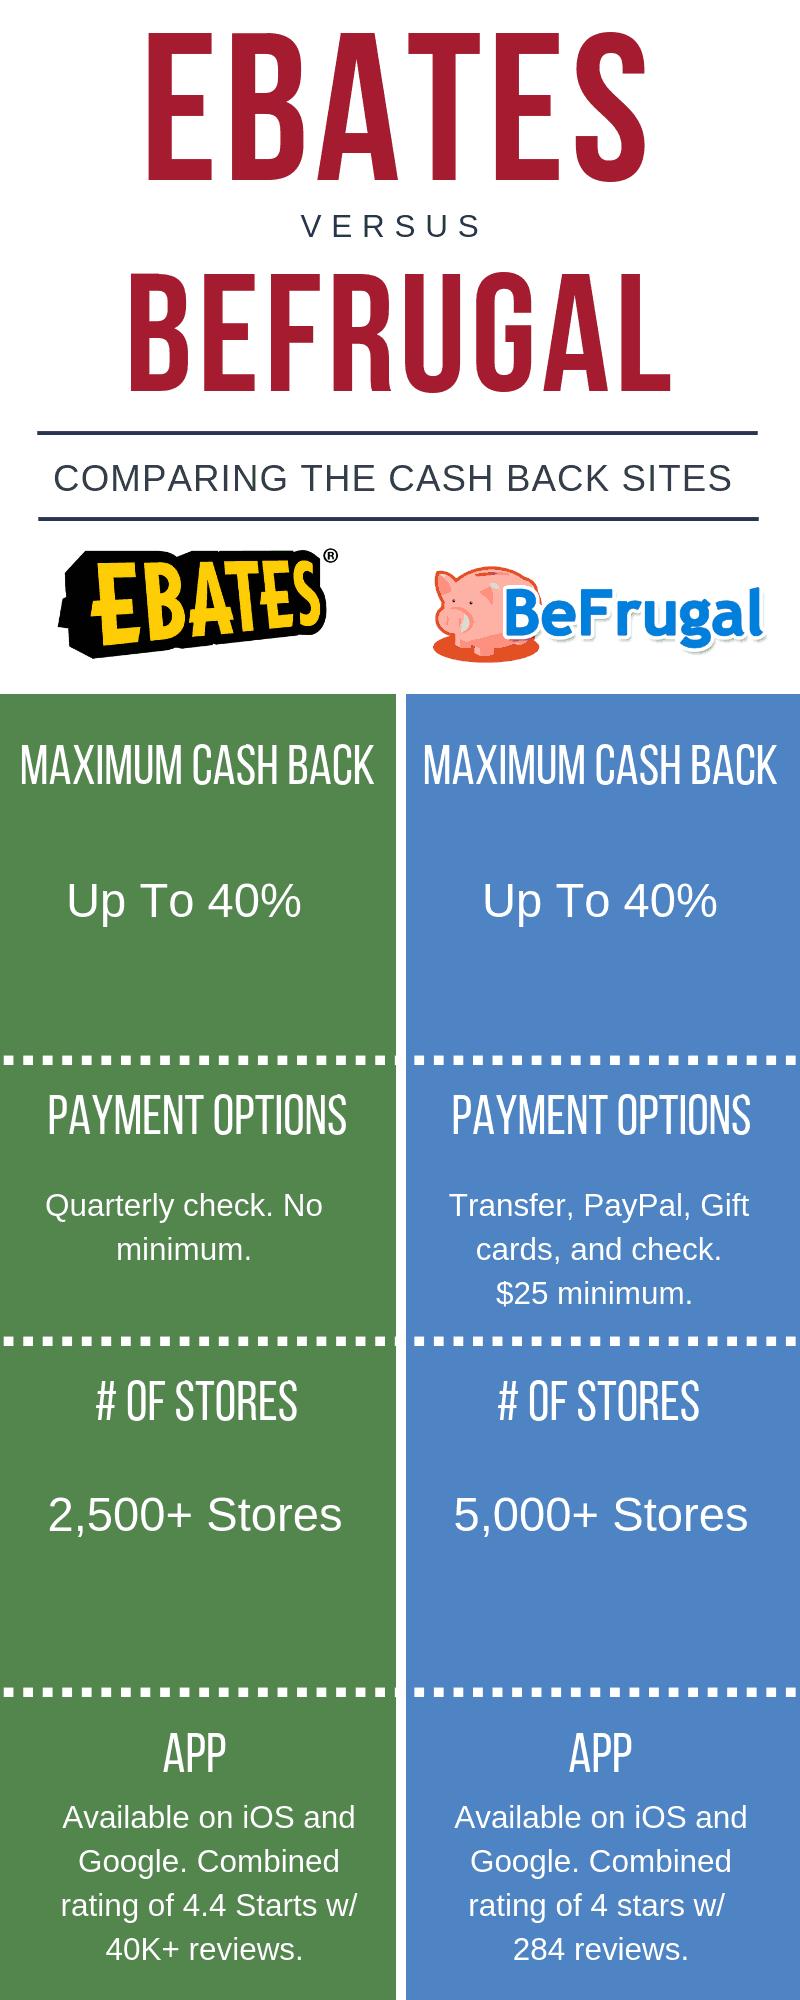 befrugal vs ebates infographic